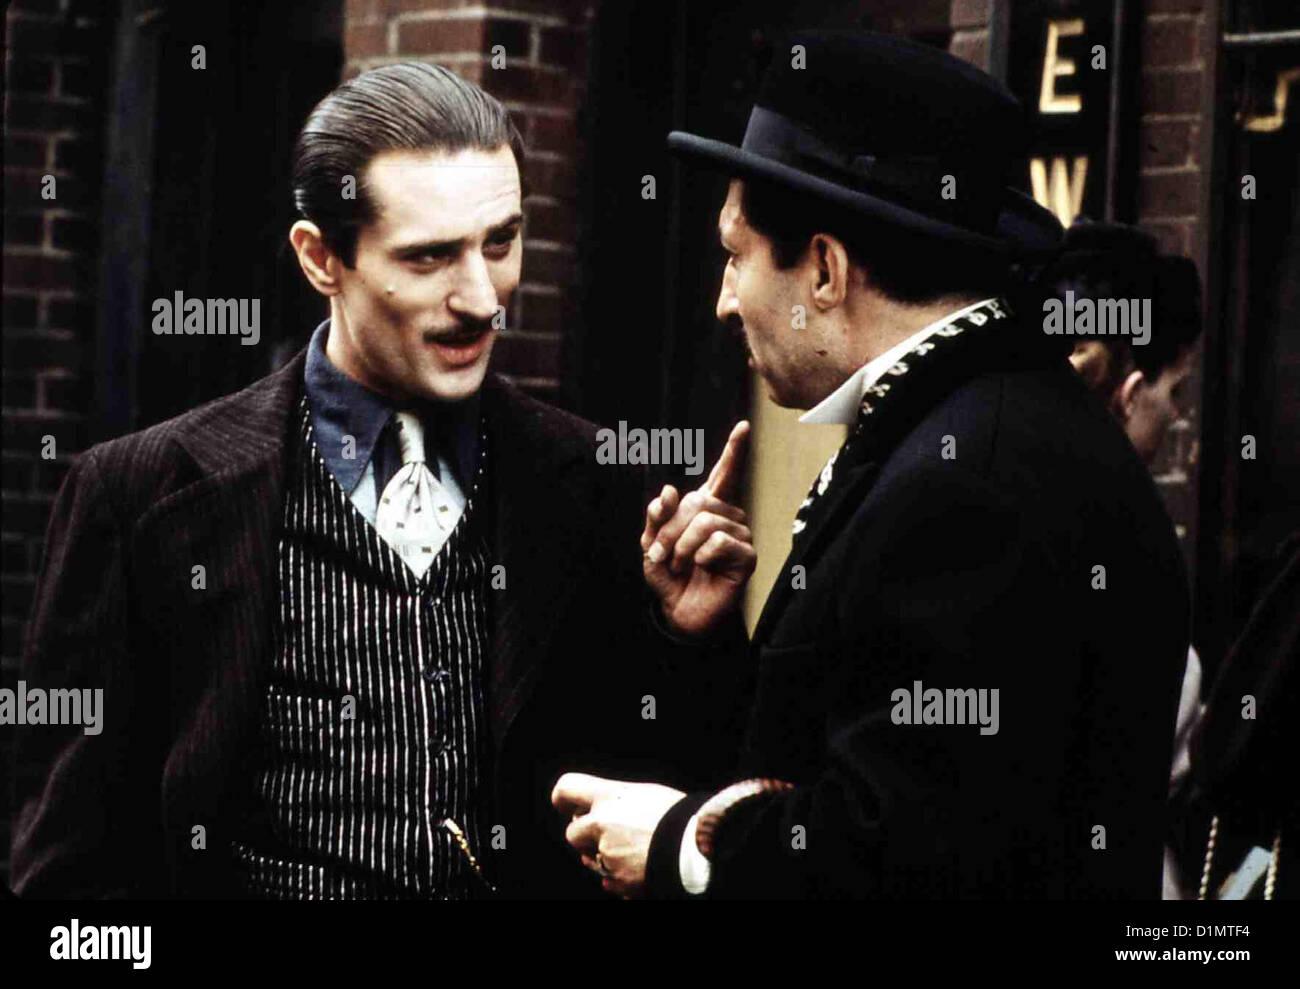 Der Pate Teil Ii Godfather Ii The Robert De Niro L